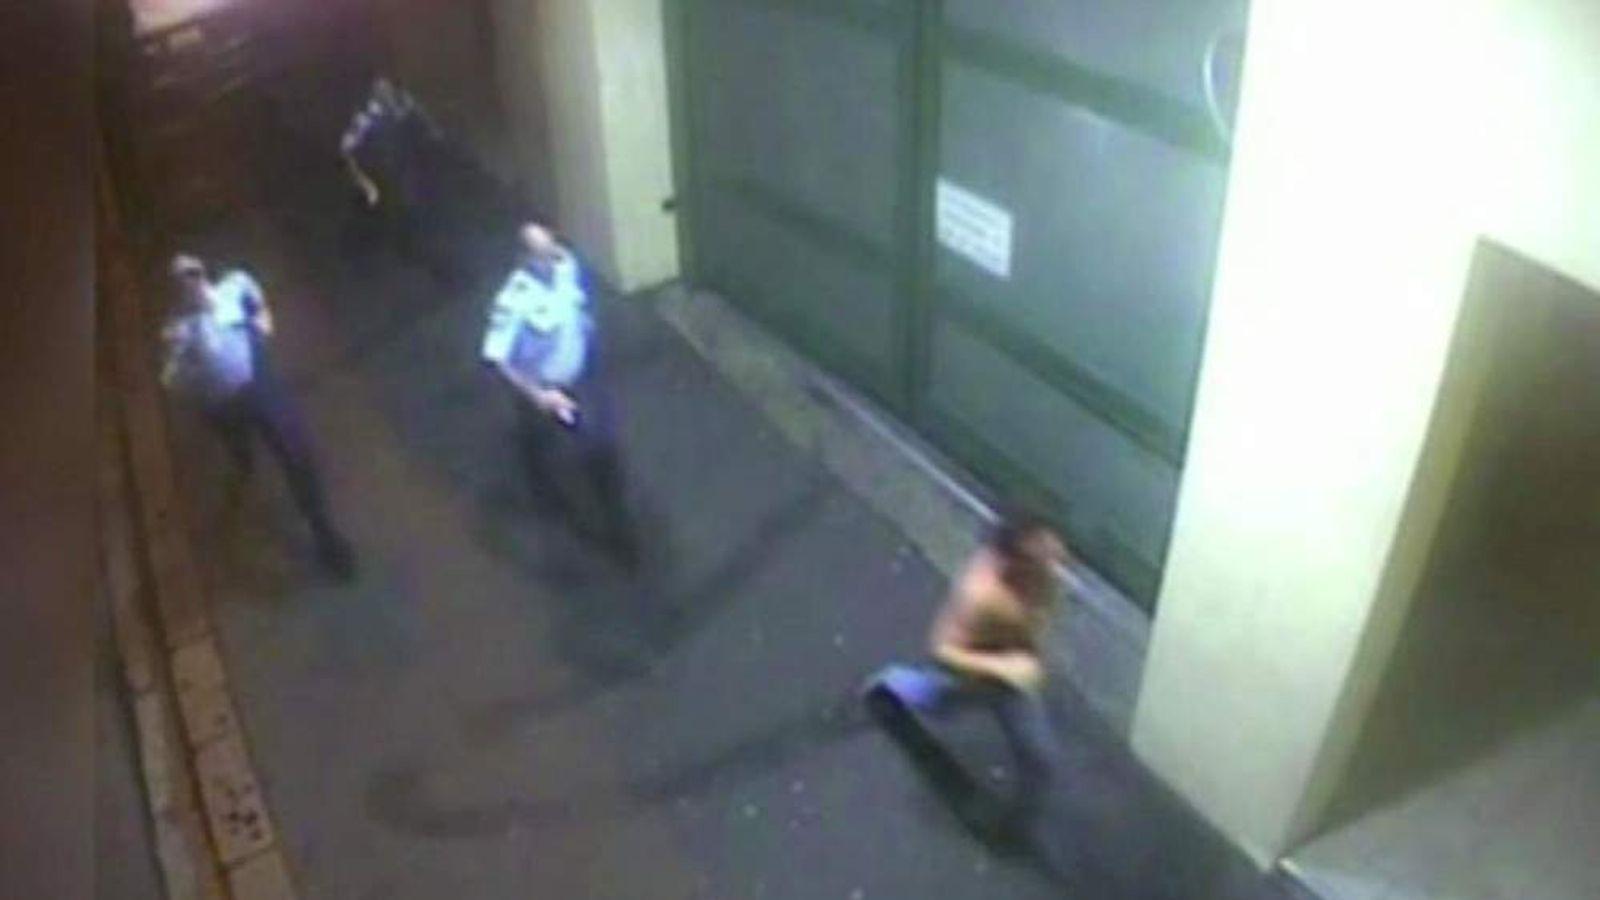 Police chase Roberto Laudisio Curti